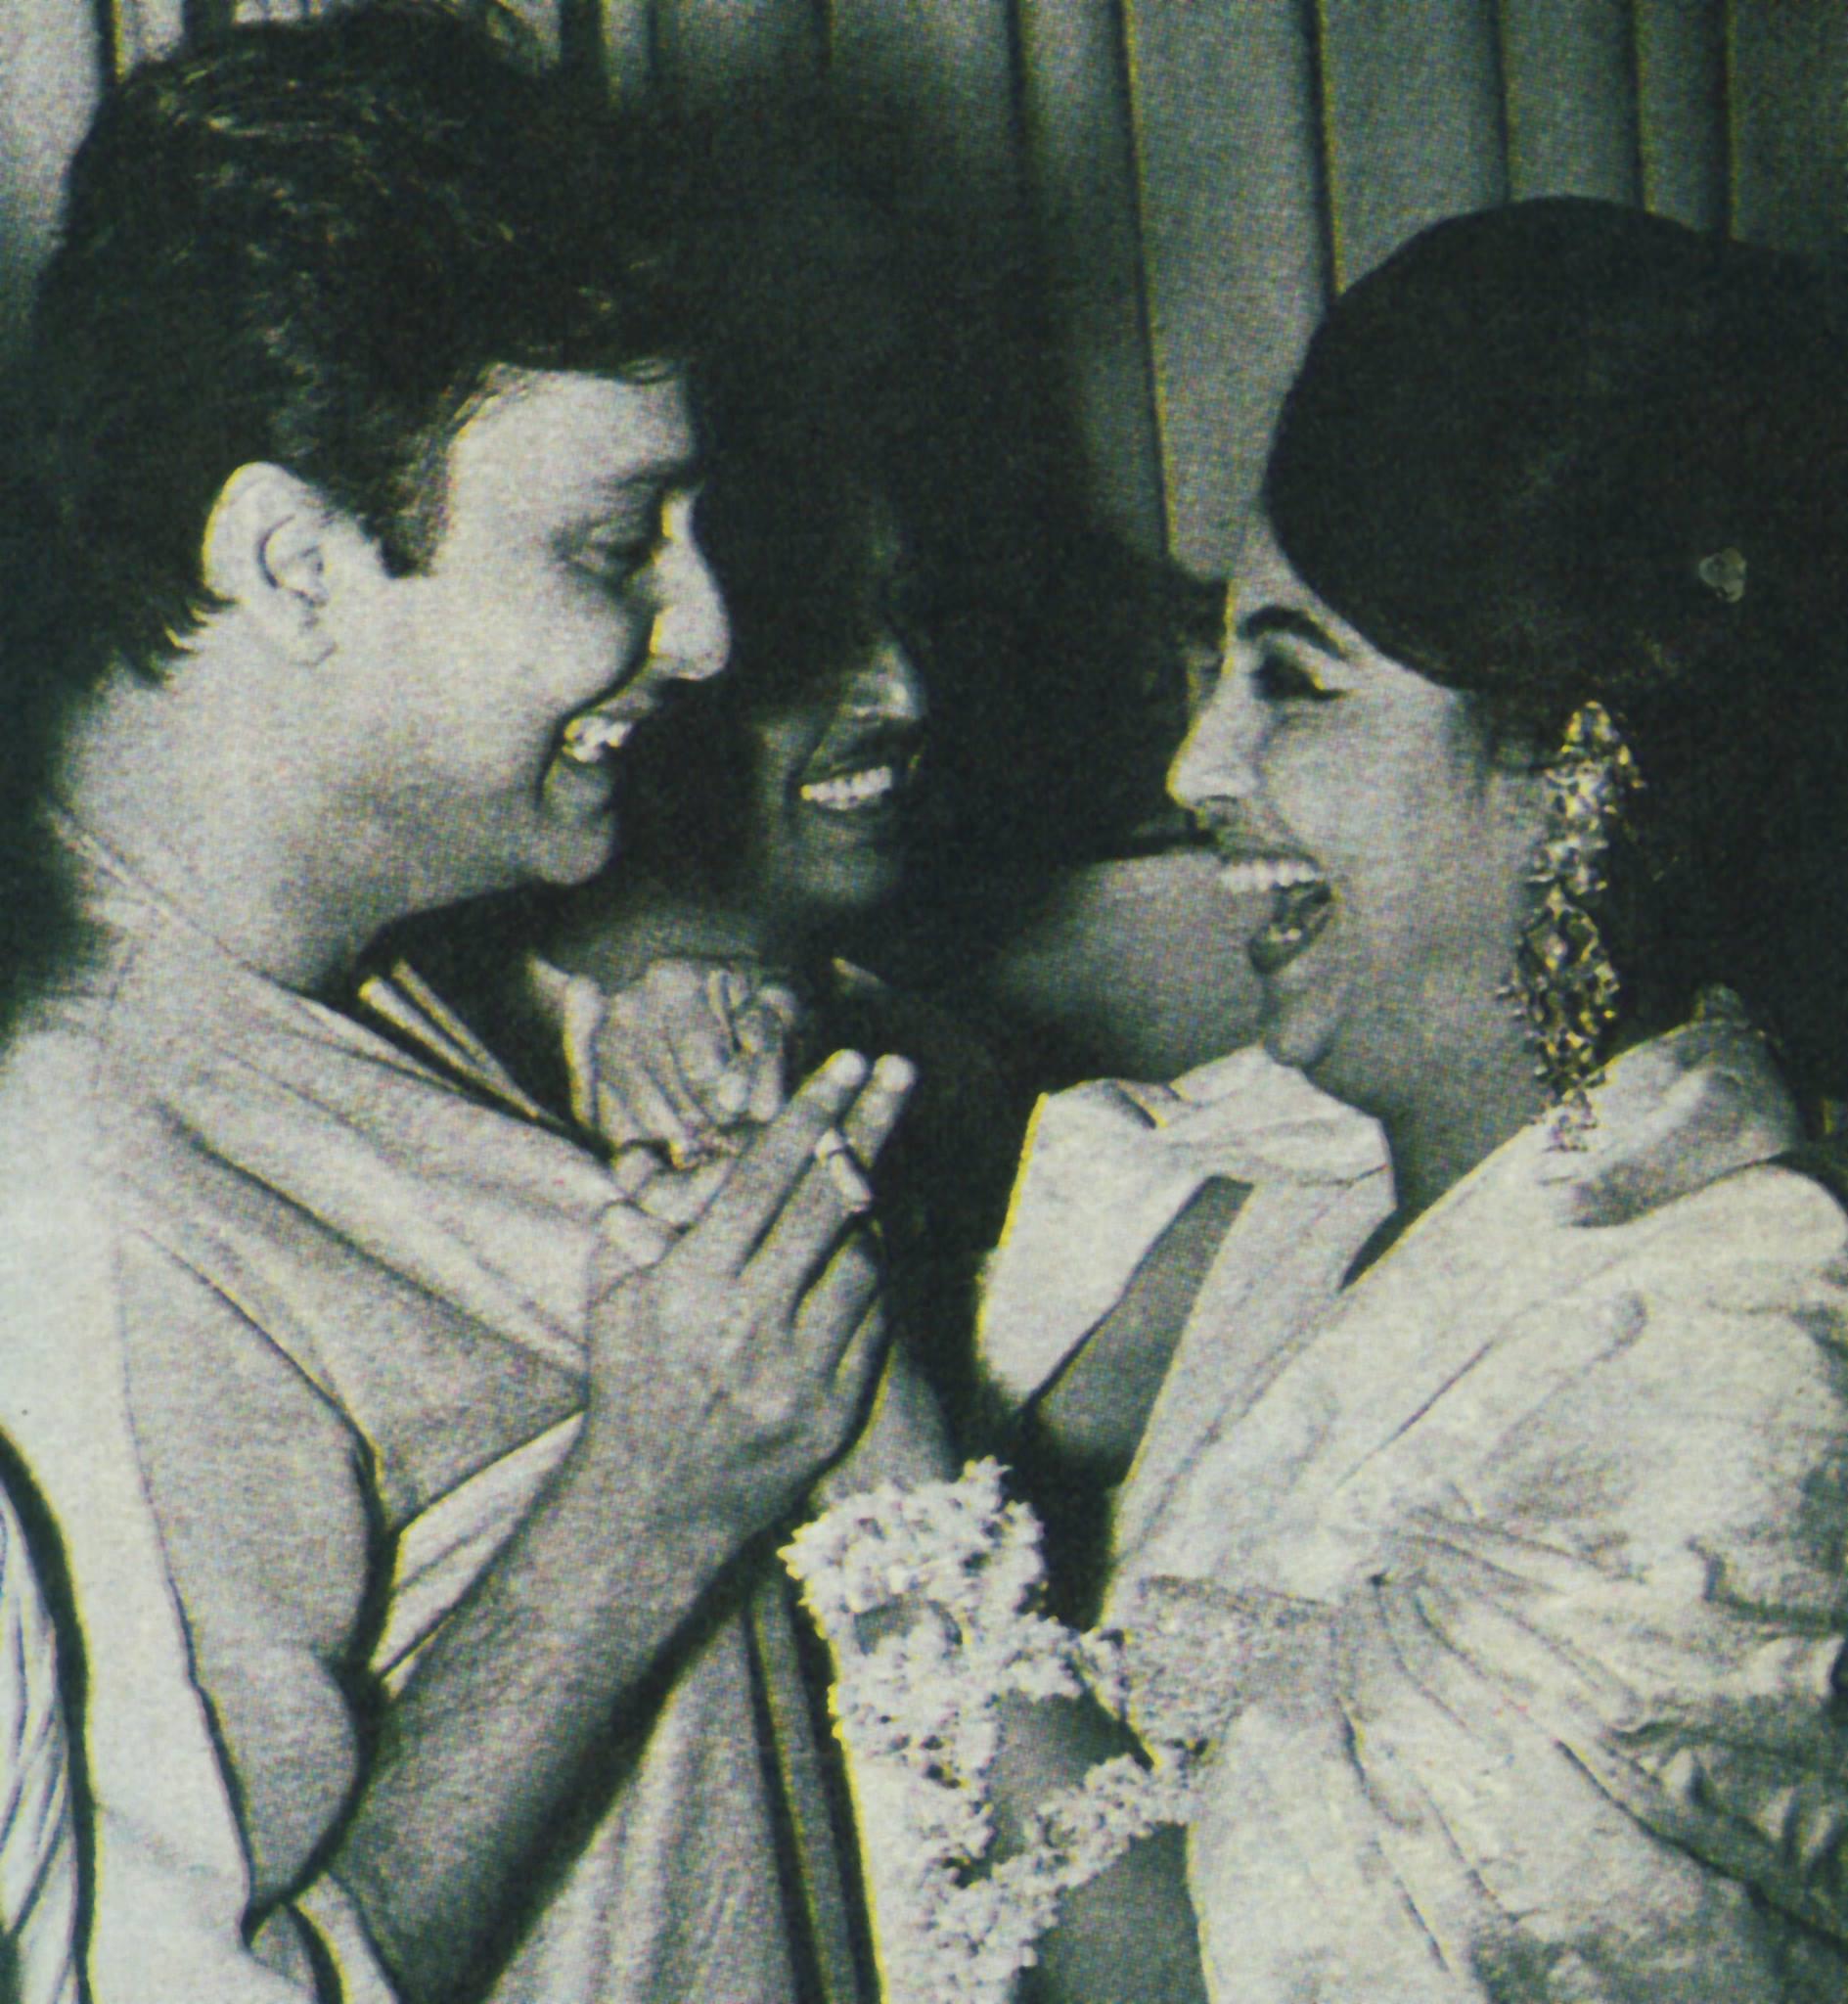 Soumitra Chatterjee and Suchitra Sen